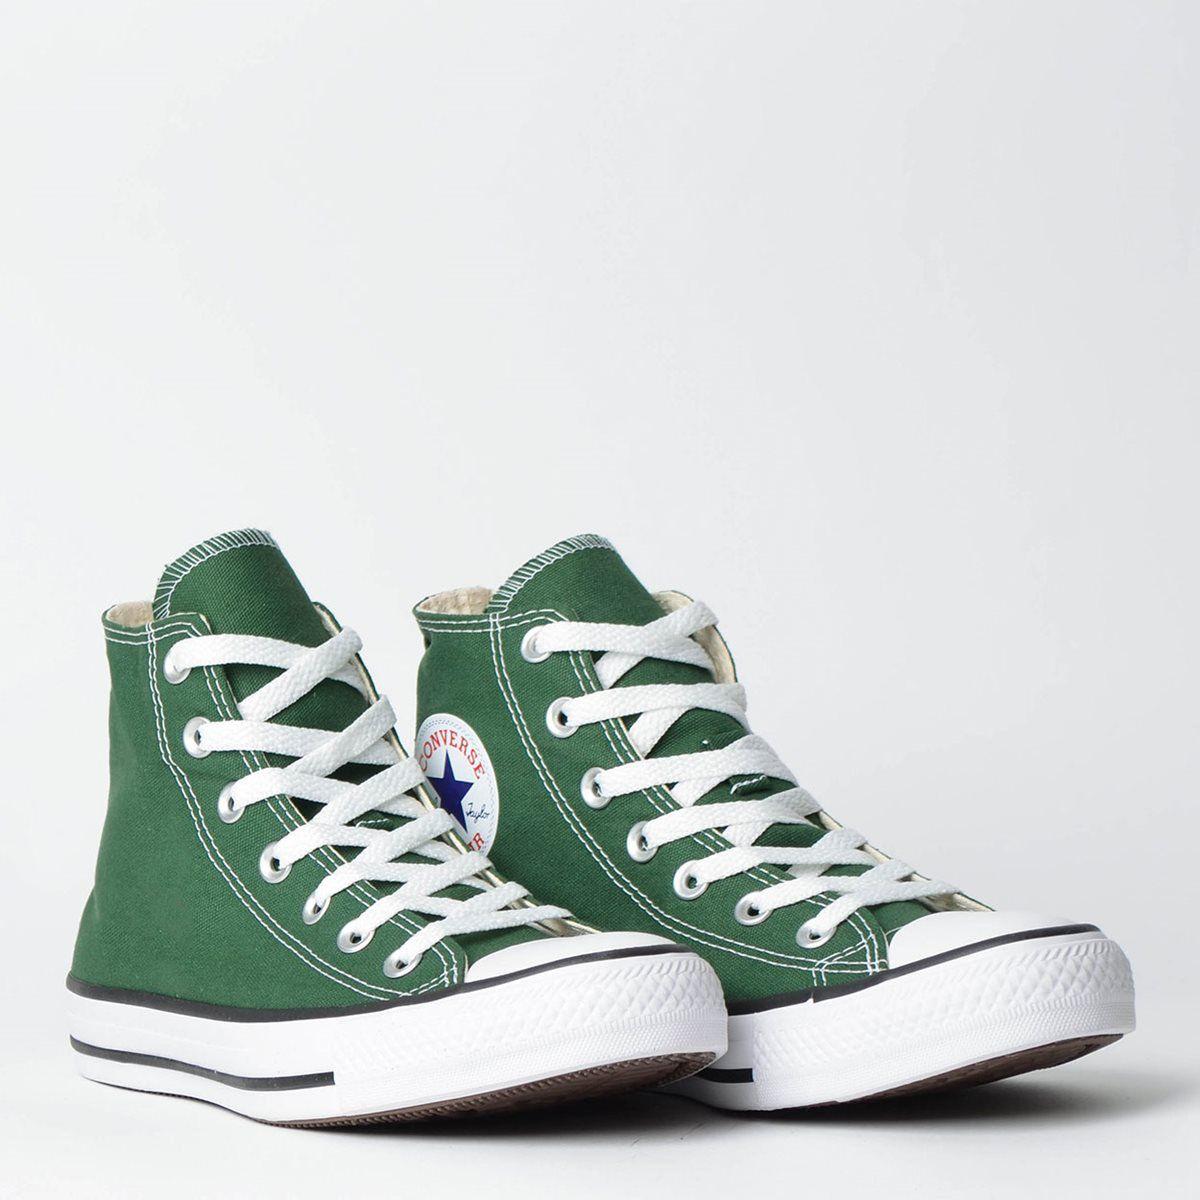 Tênis Converse Chuck Taylor All Star Verde Floresta/Preto/Branco